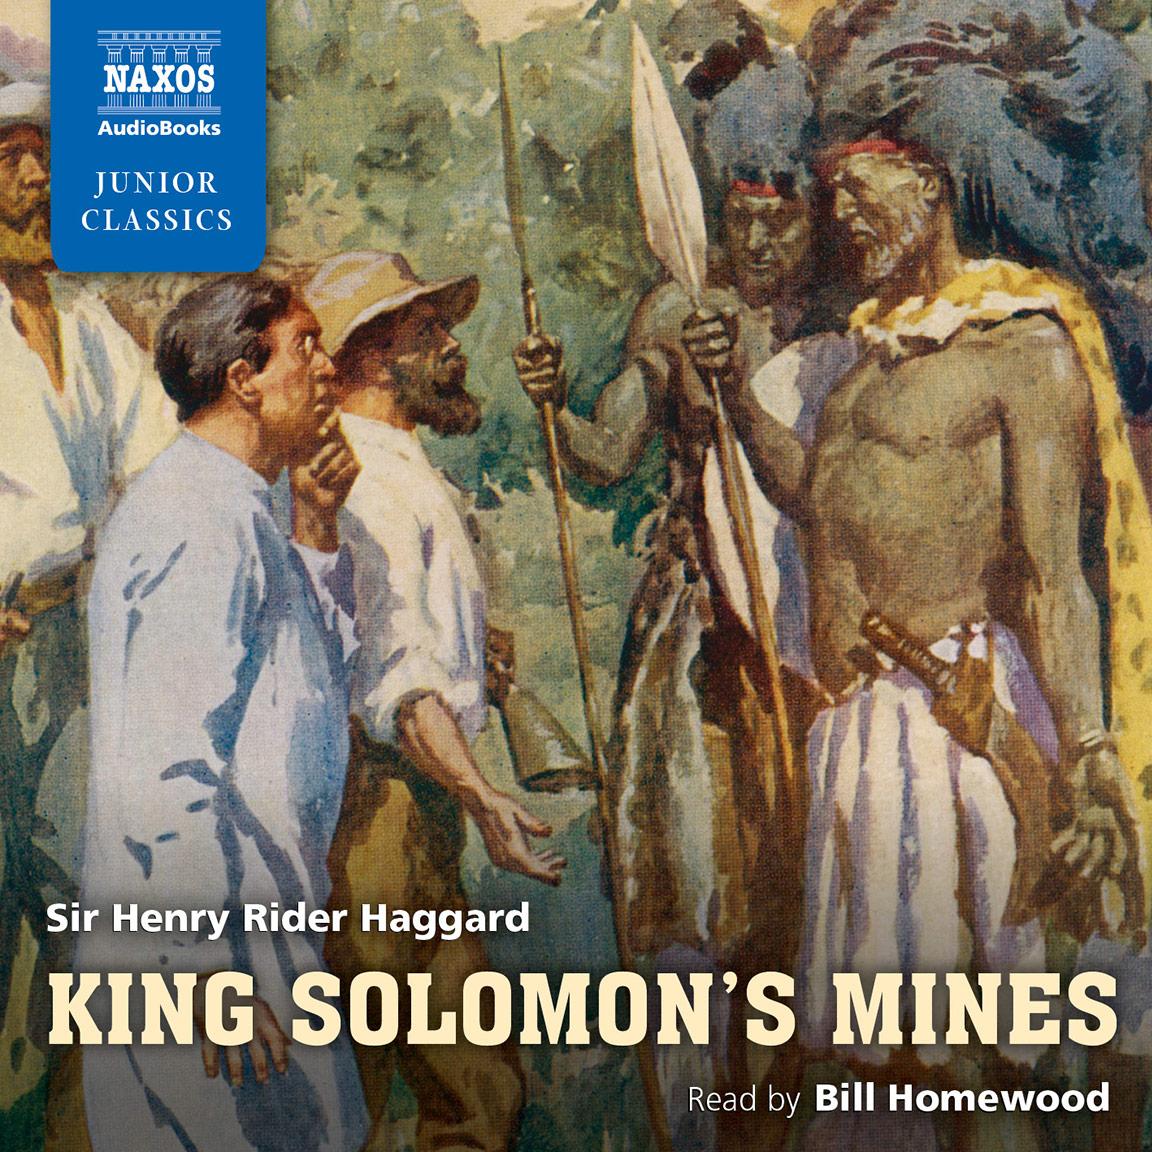 King Solomon's Mines (abridged)